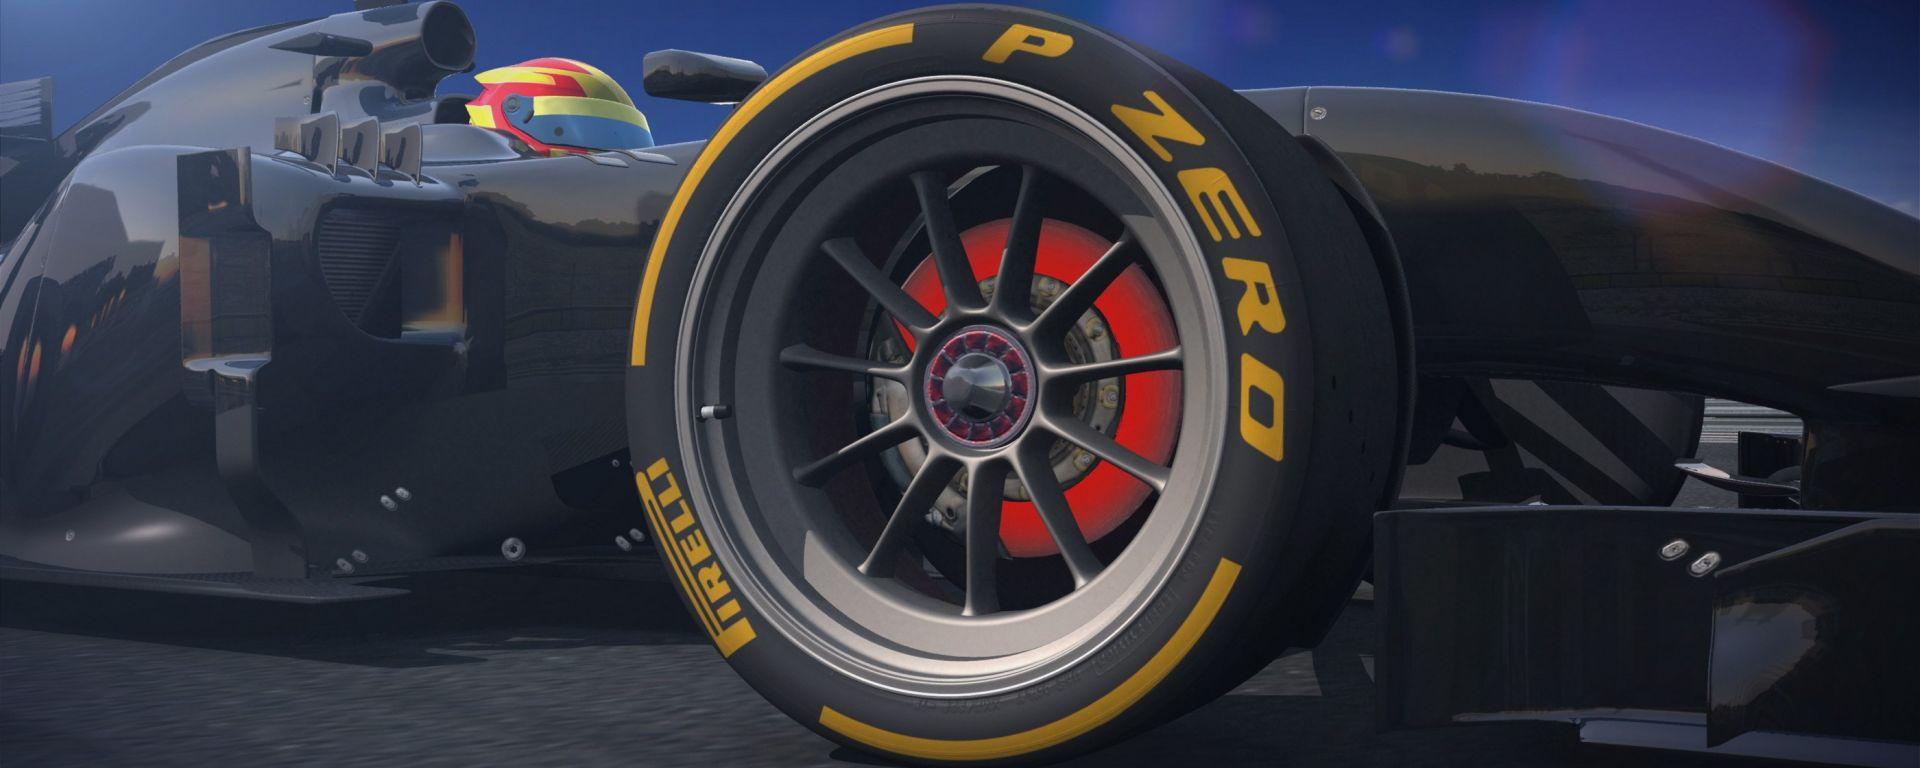 Pirelli 18 pollici concept